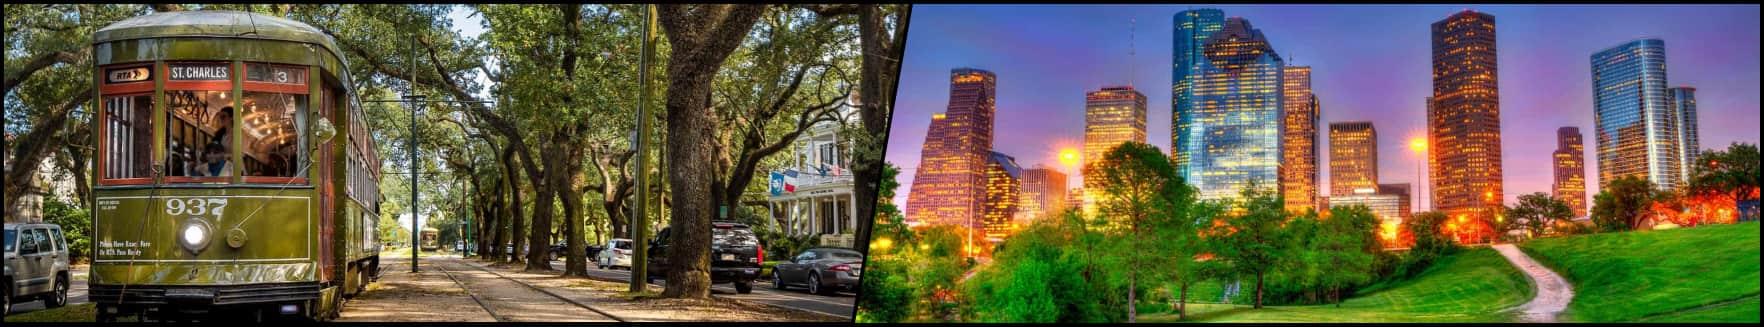 New Orleans - Houston